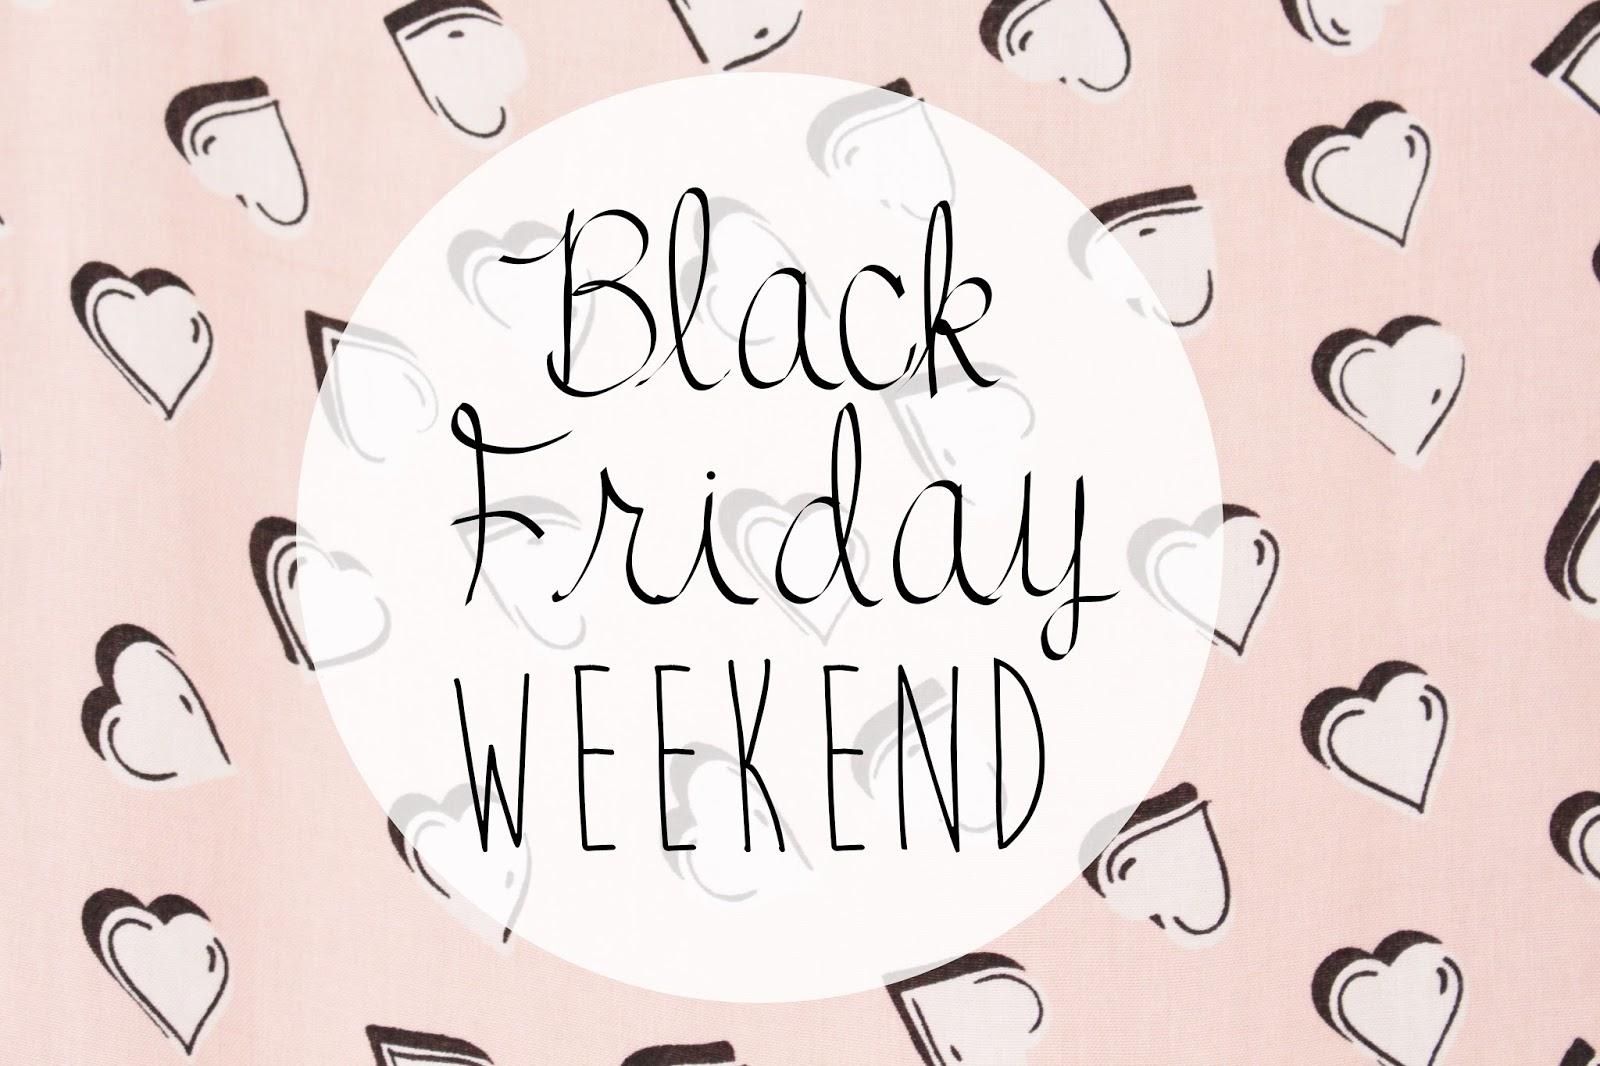 Black Friday Weekend Beauty Deals UK 2014